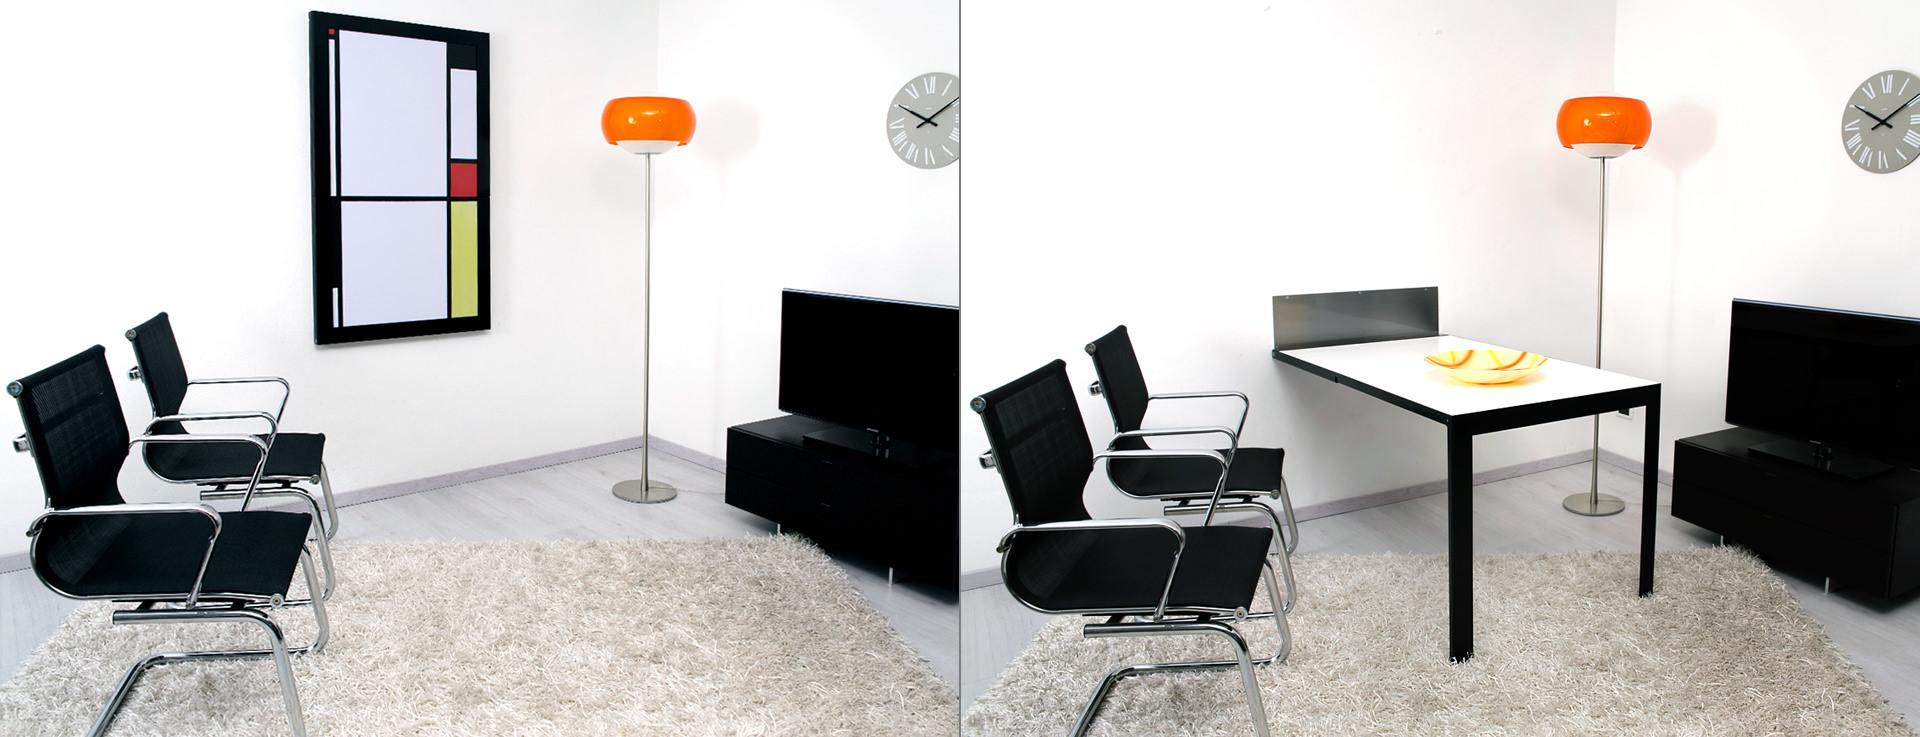 I tavoli a scomparsa di ntc new table concept - Tavoli ribaltabili a parete ...